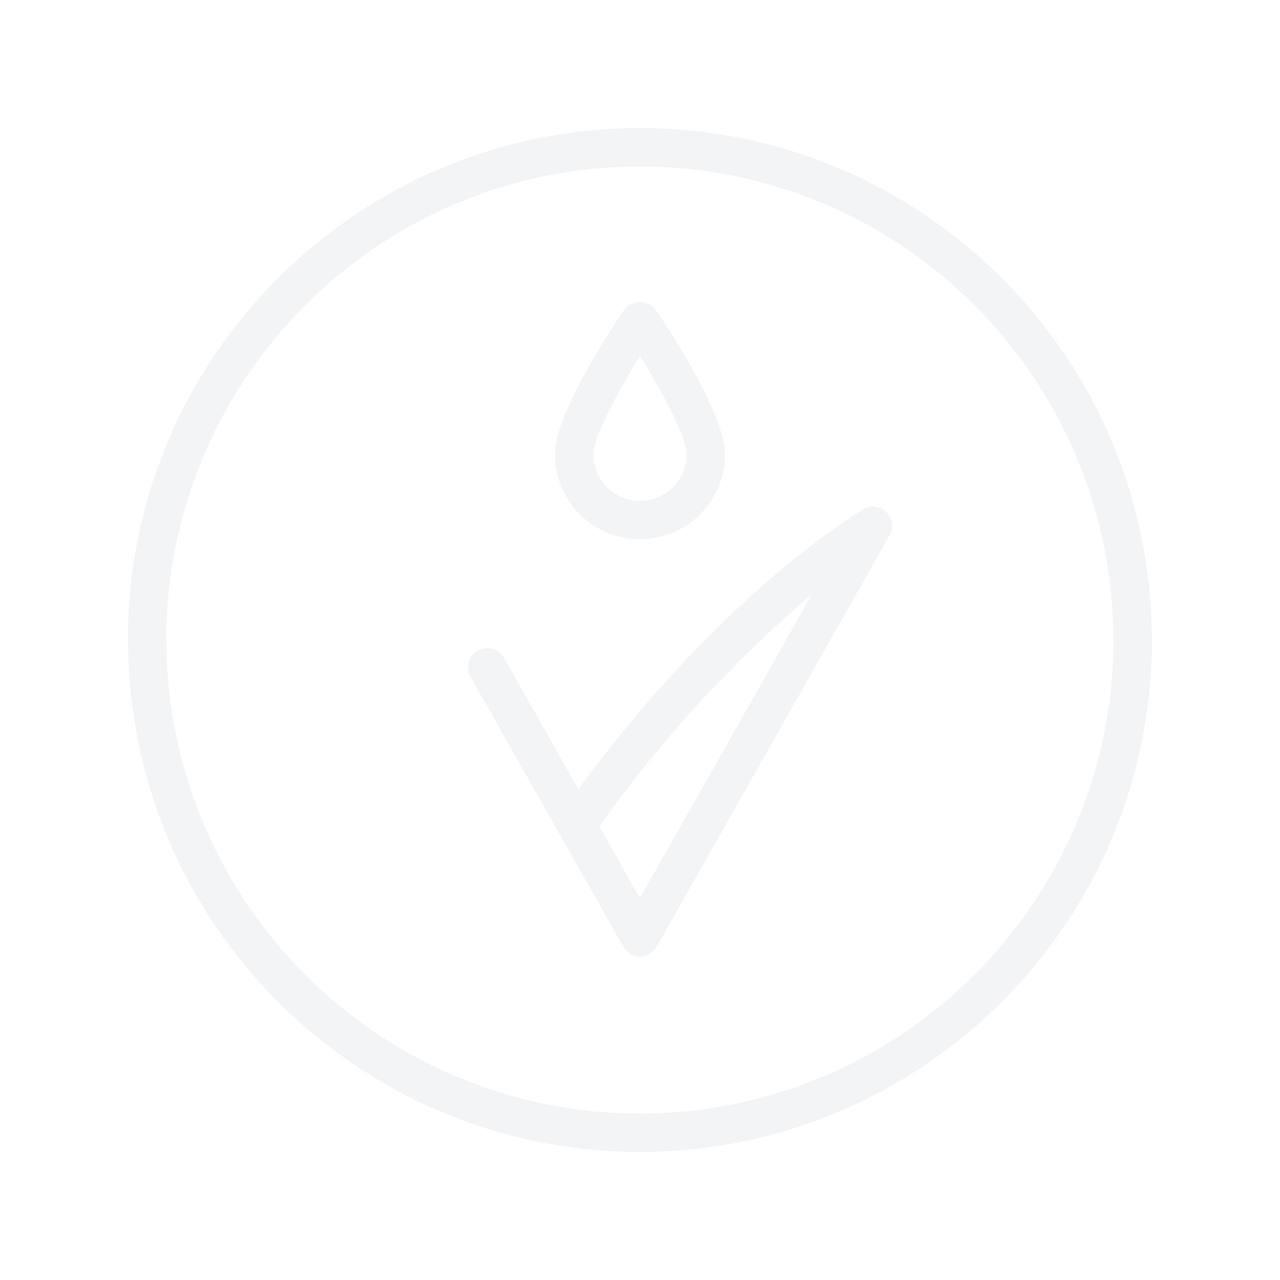 KERASTASE Discipline Curl Ideal Mask 200ml